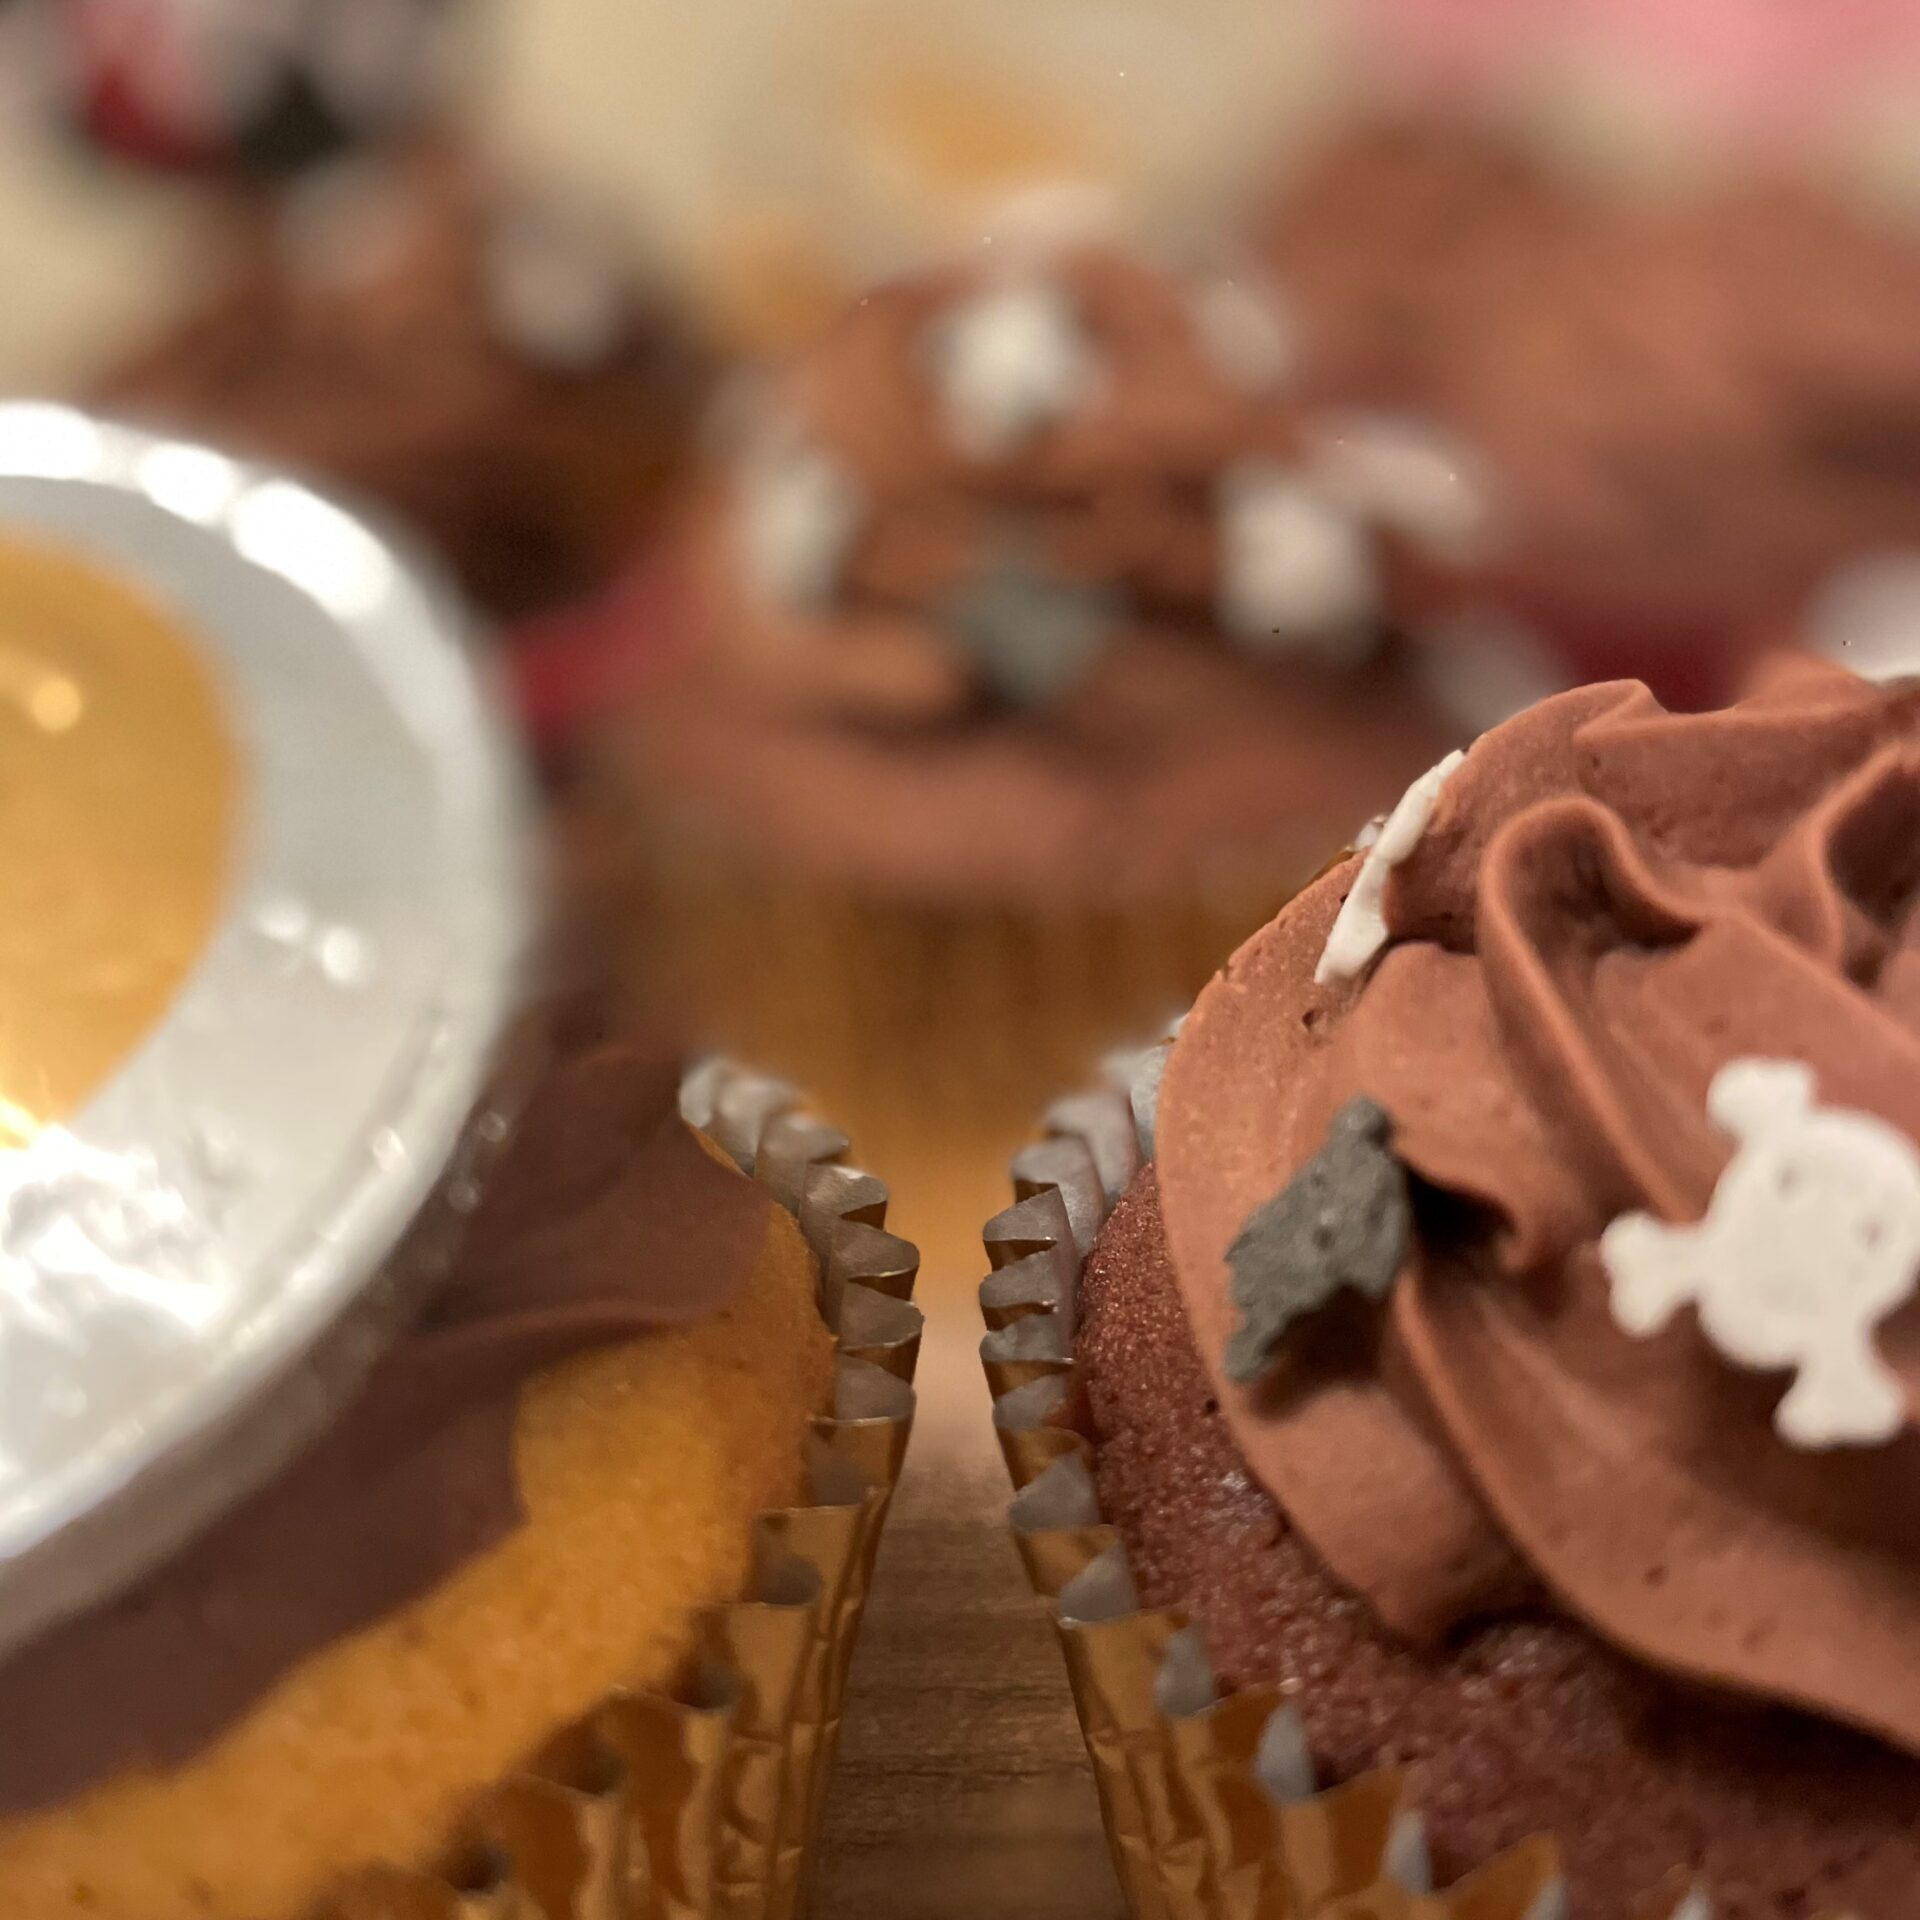 caupcakes a torino